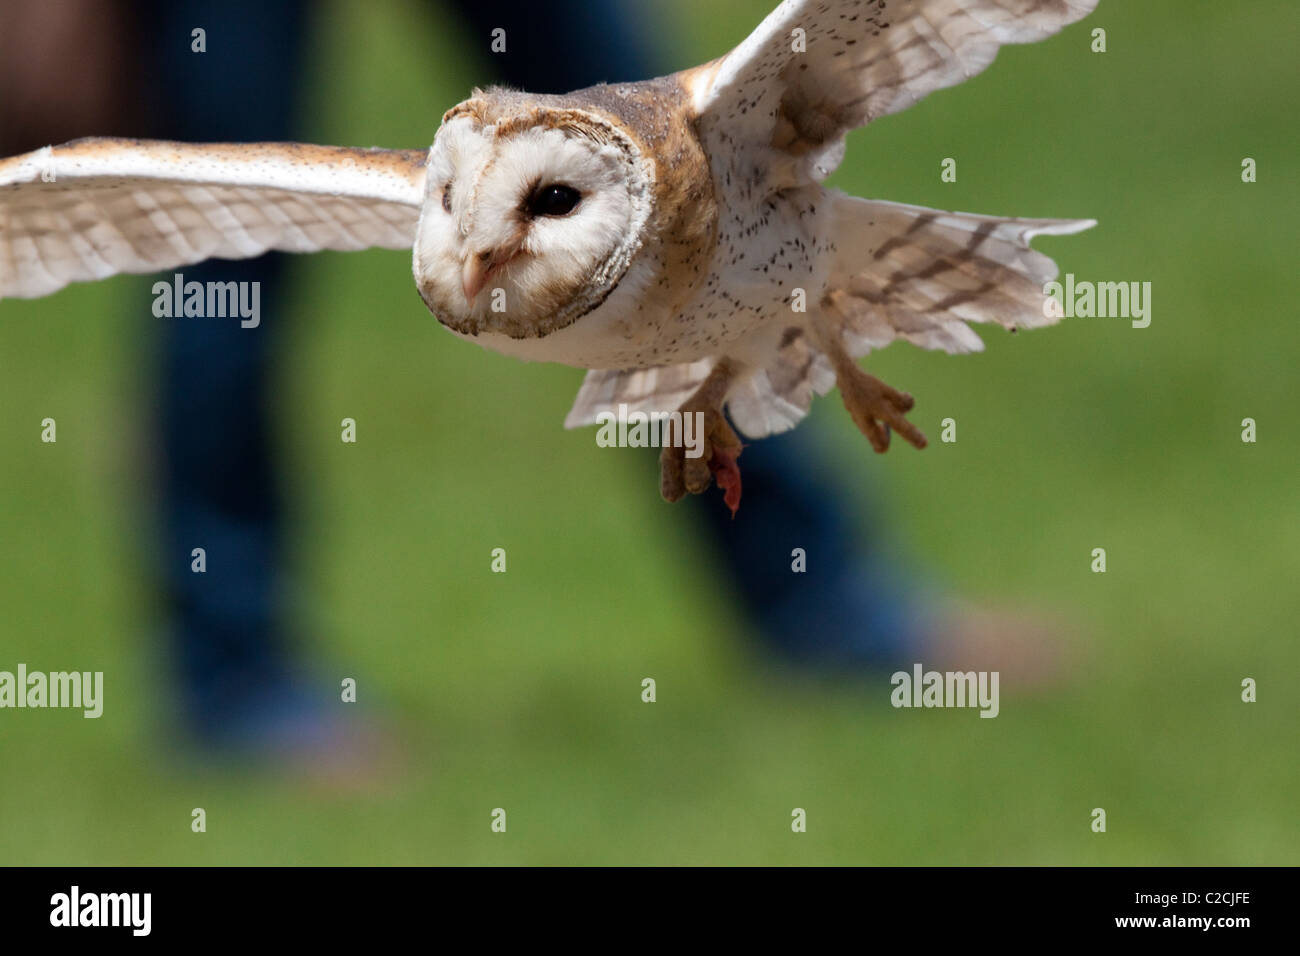 Barn owl at the African Bird of Prey Sanctuary flight show. - Stock Image